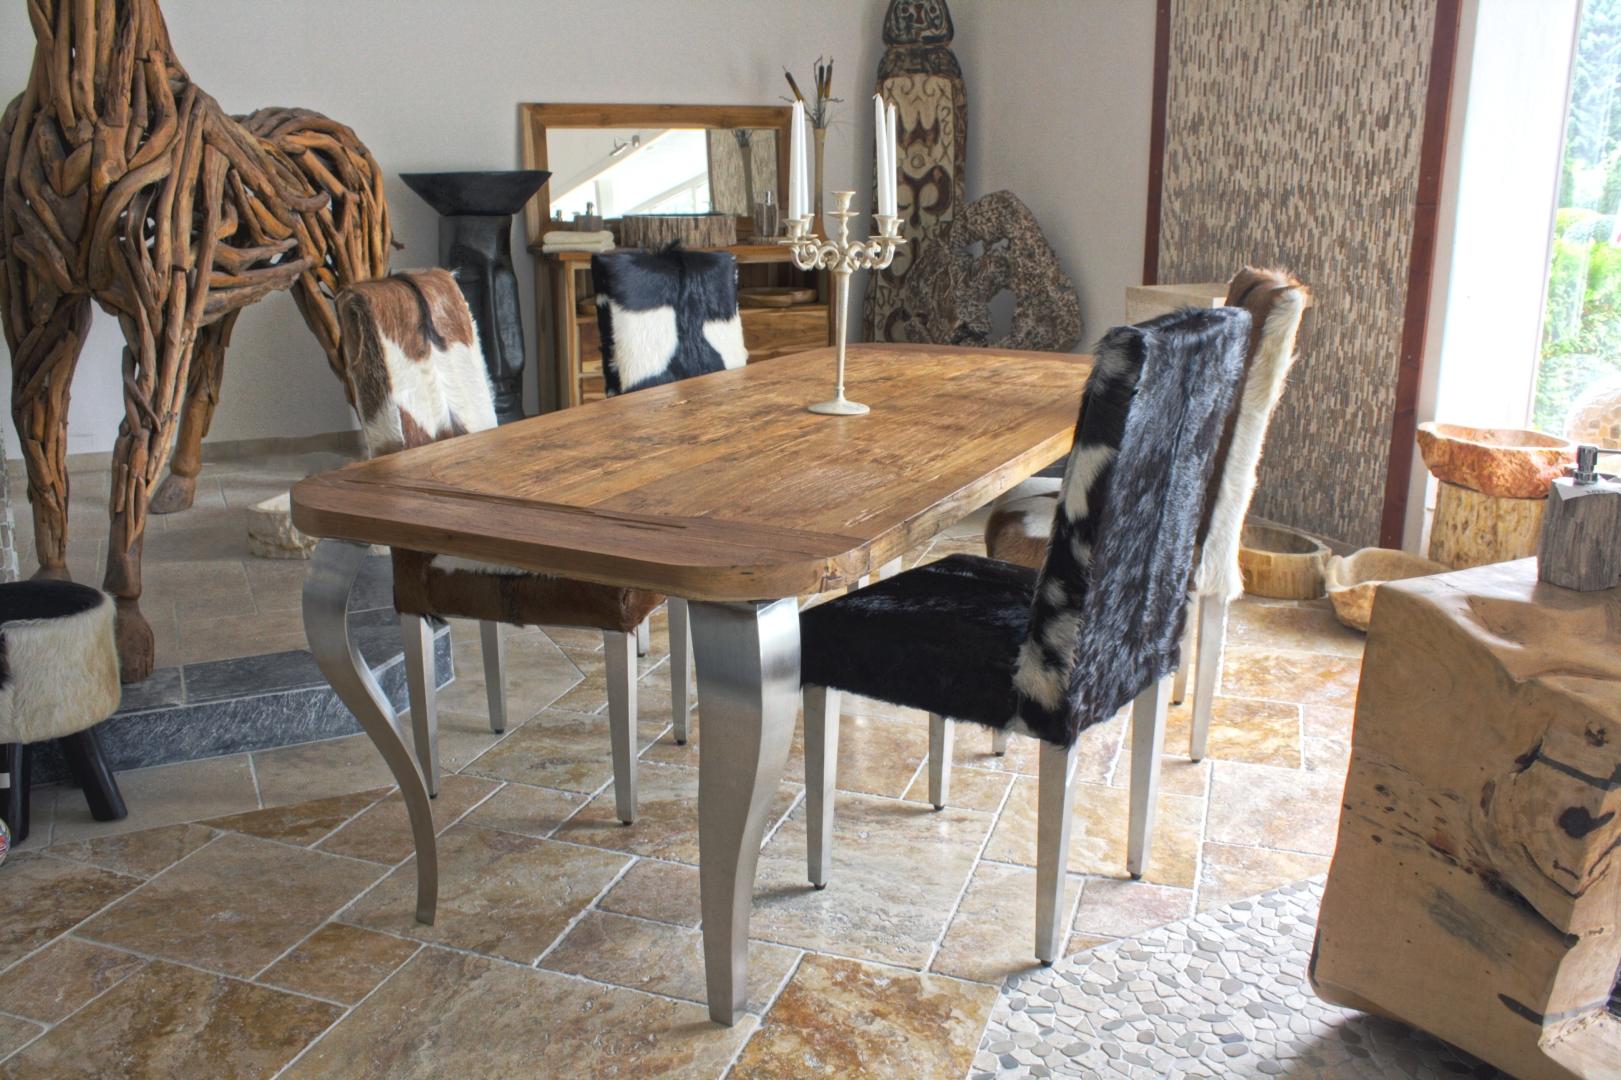 esstisch holz und edelstahl. Black Bedroom Furniture Sets. Home Design Ideas